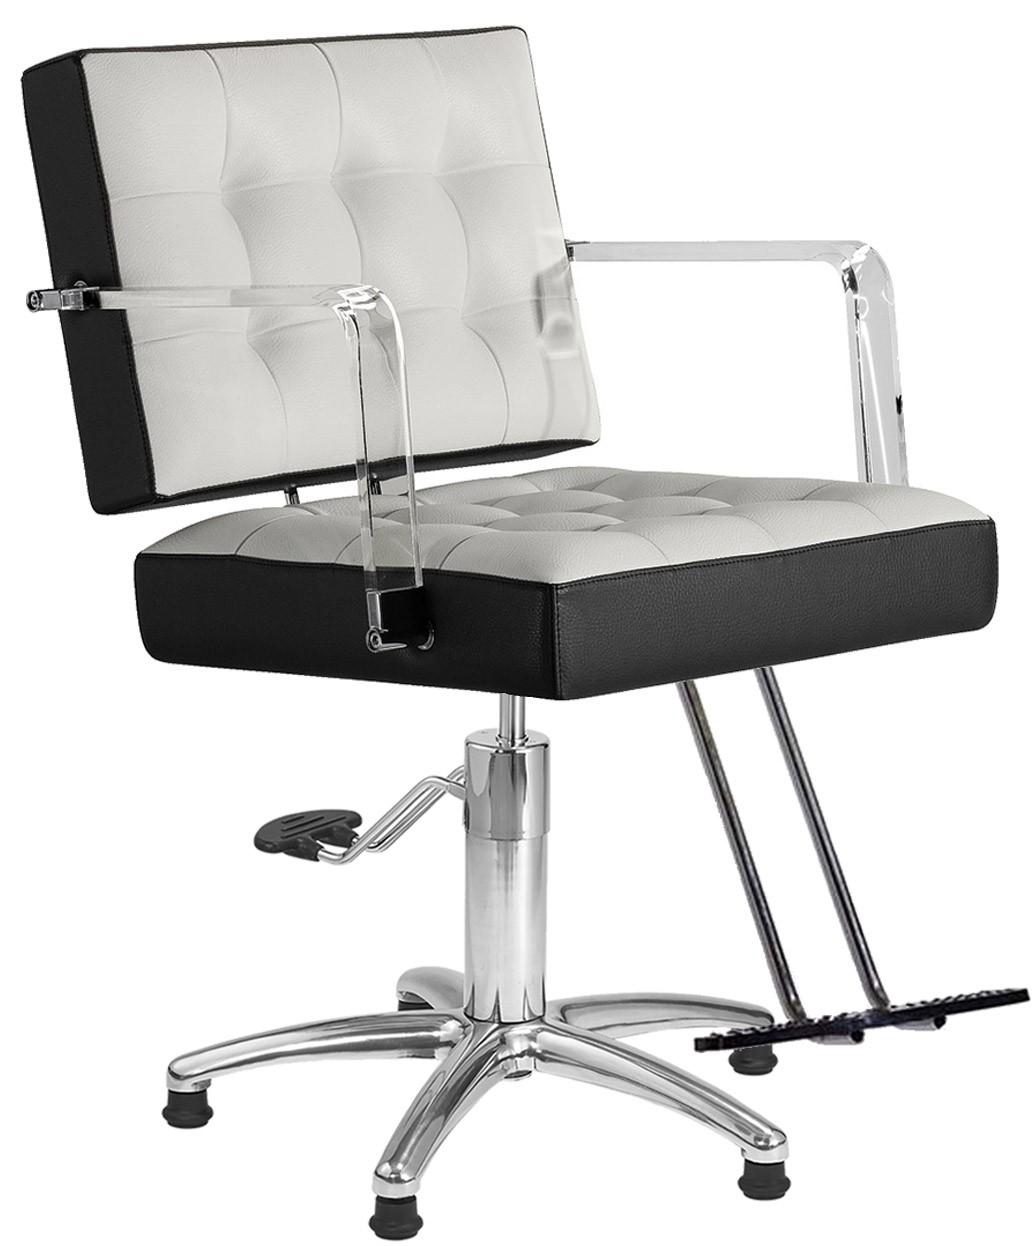 Salon Ambience SH-420 Diamond Styling Chair